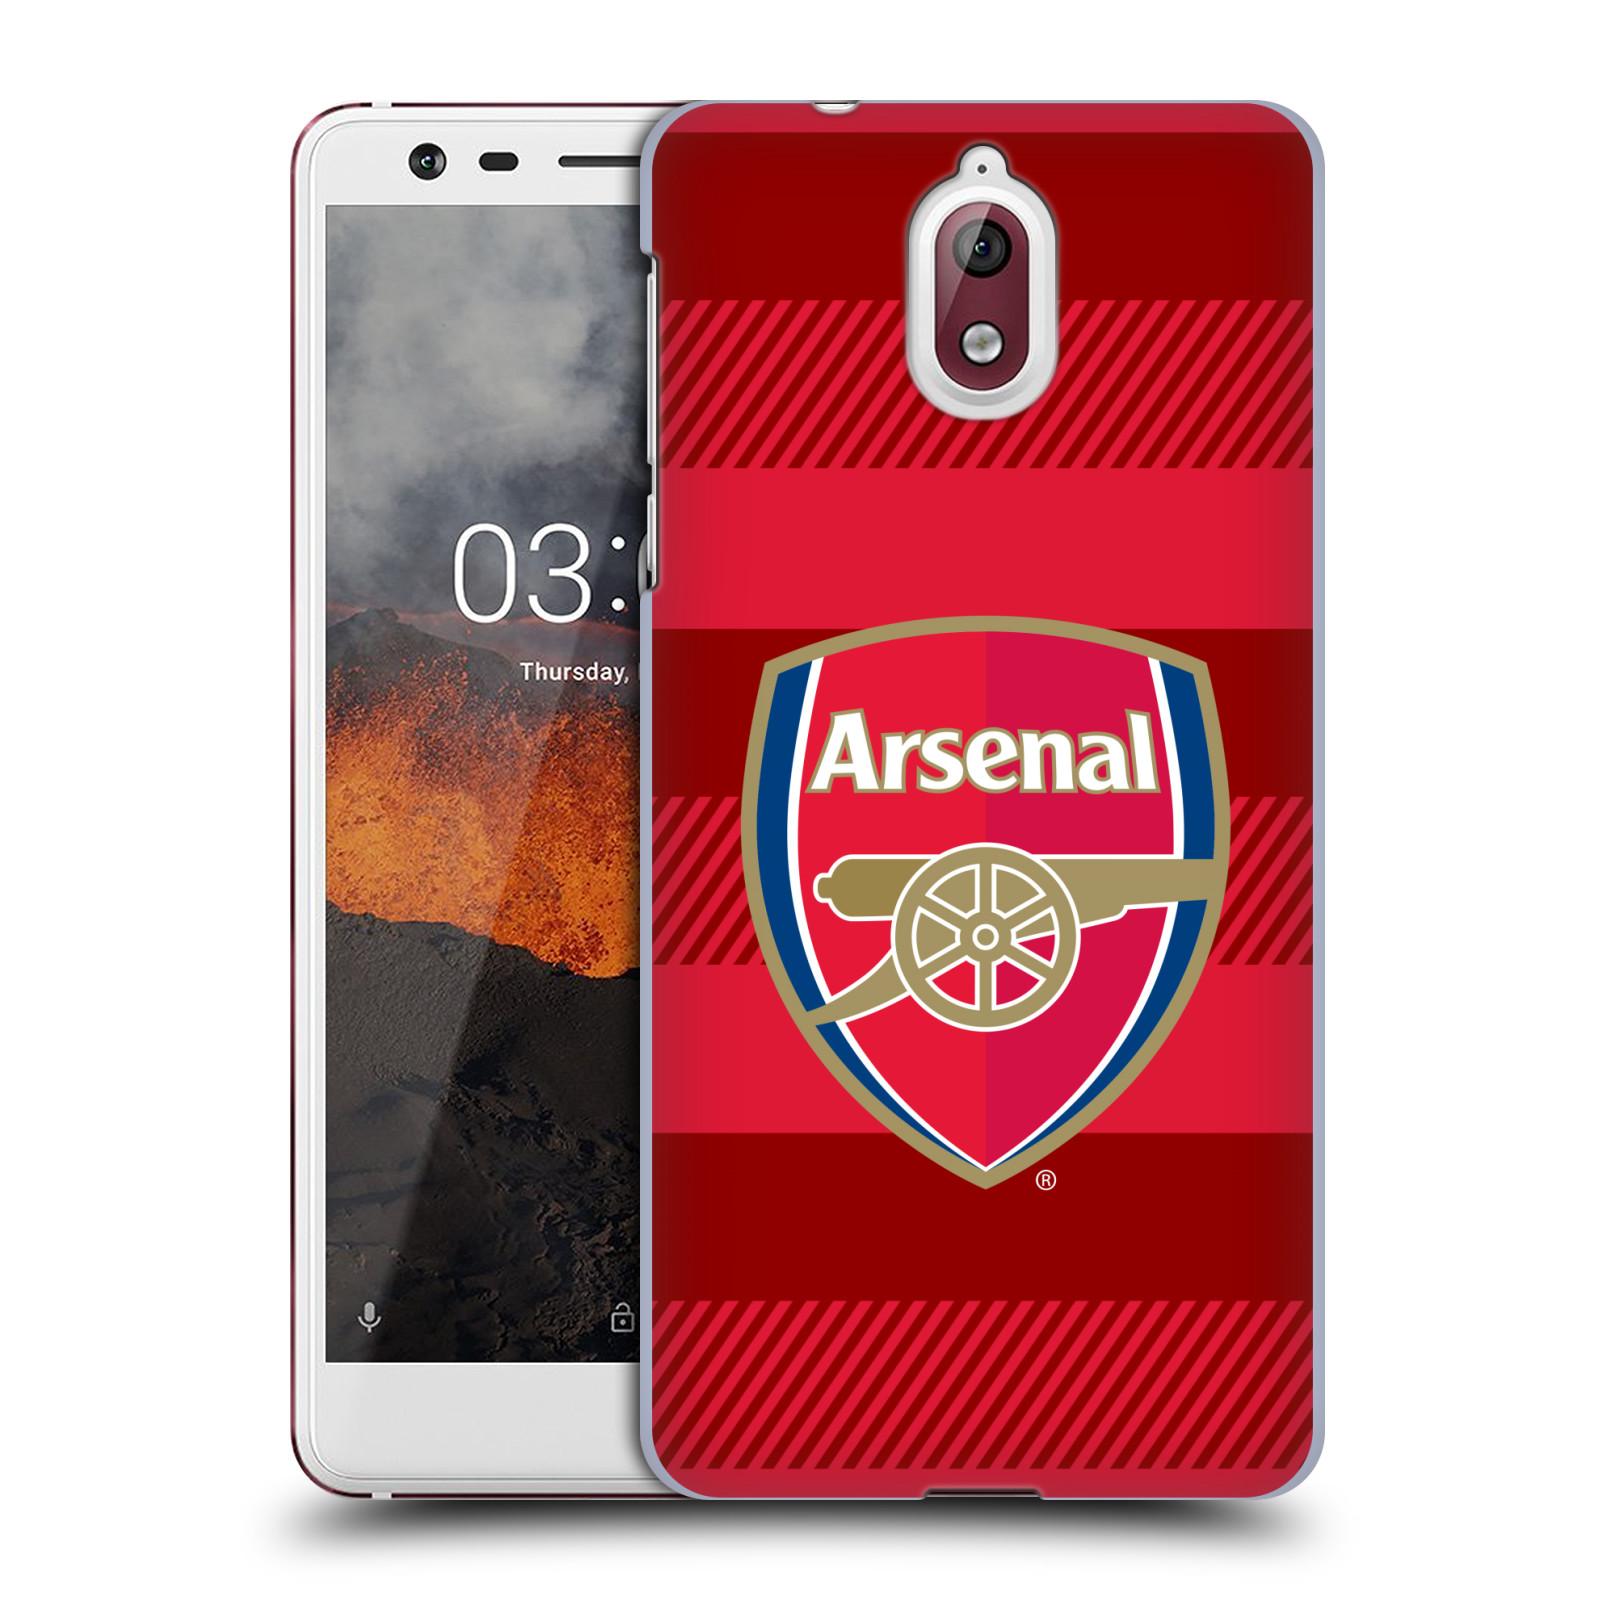 Plastové pouzdro na mobil Nokia 3.1 - Head Case - Arsenal FC - Logo s pruhy